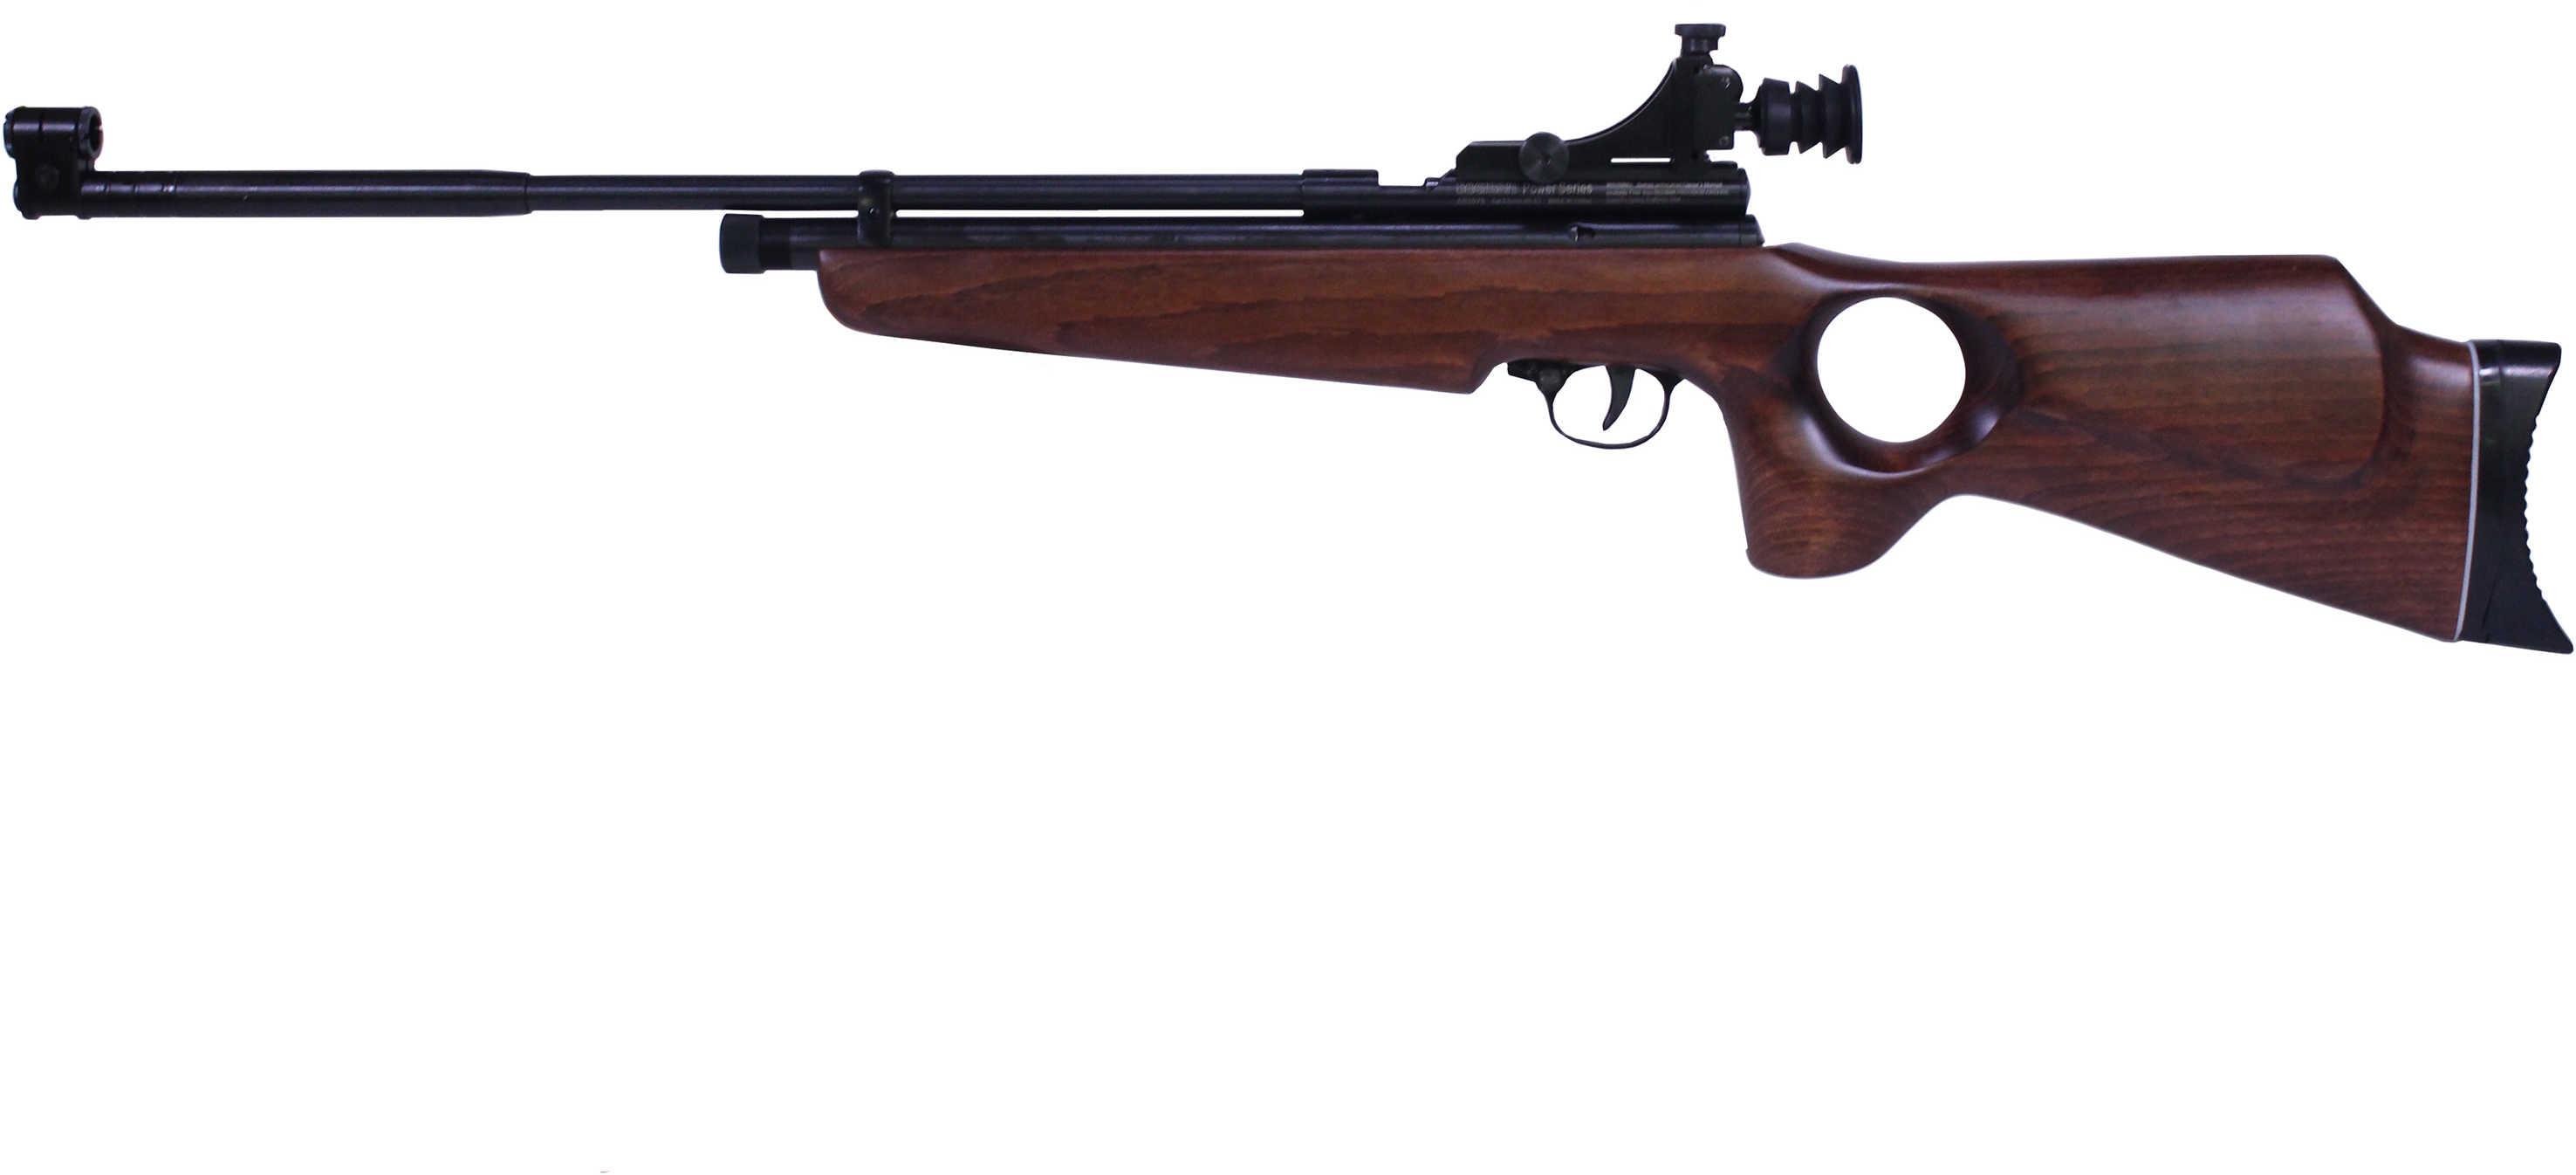 Beeman SAG CO2 Air Rifle  22 Caliber with Thumbhole Stock Md